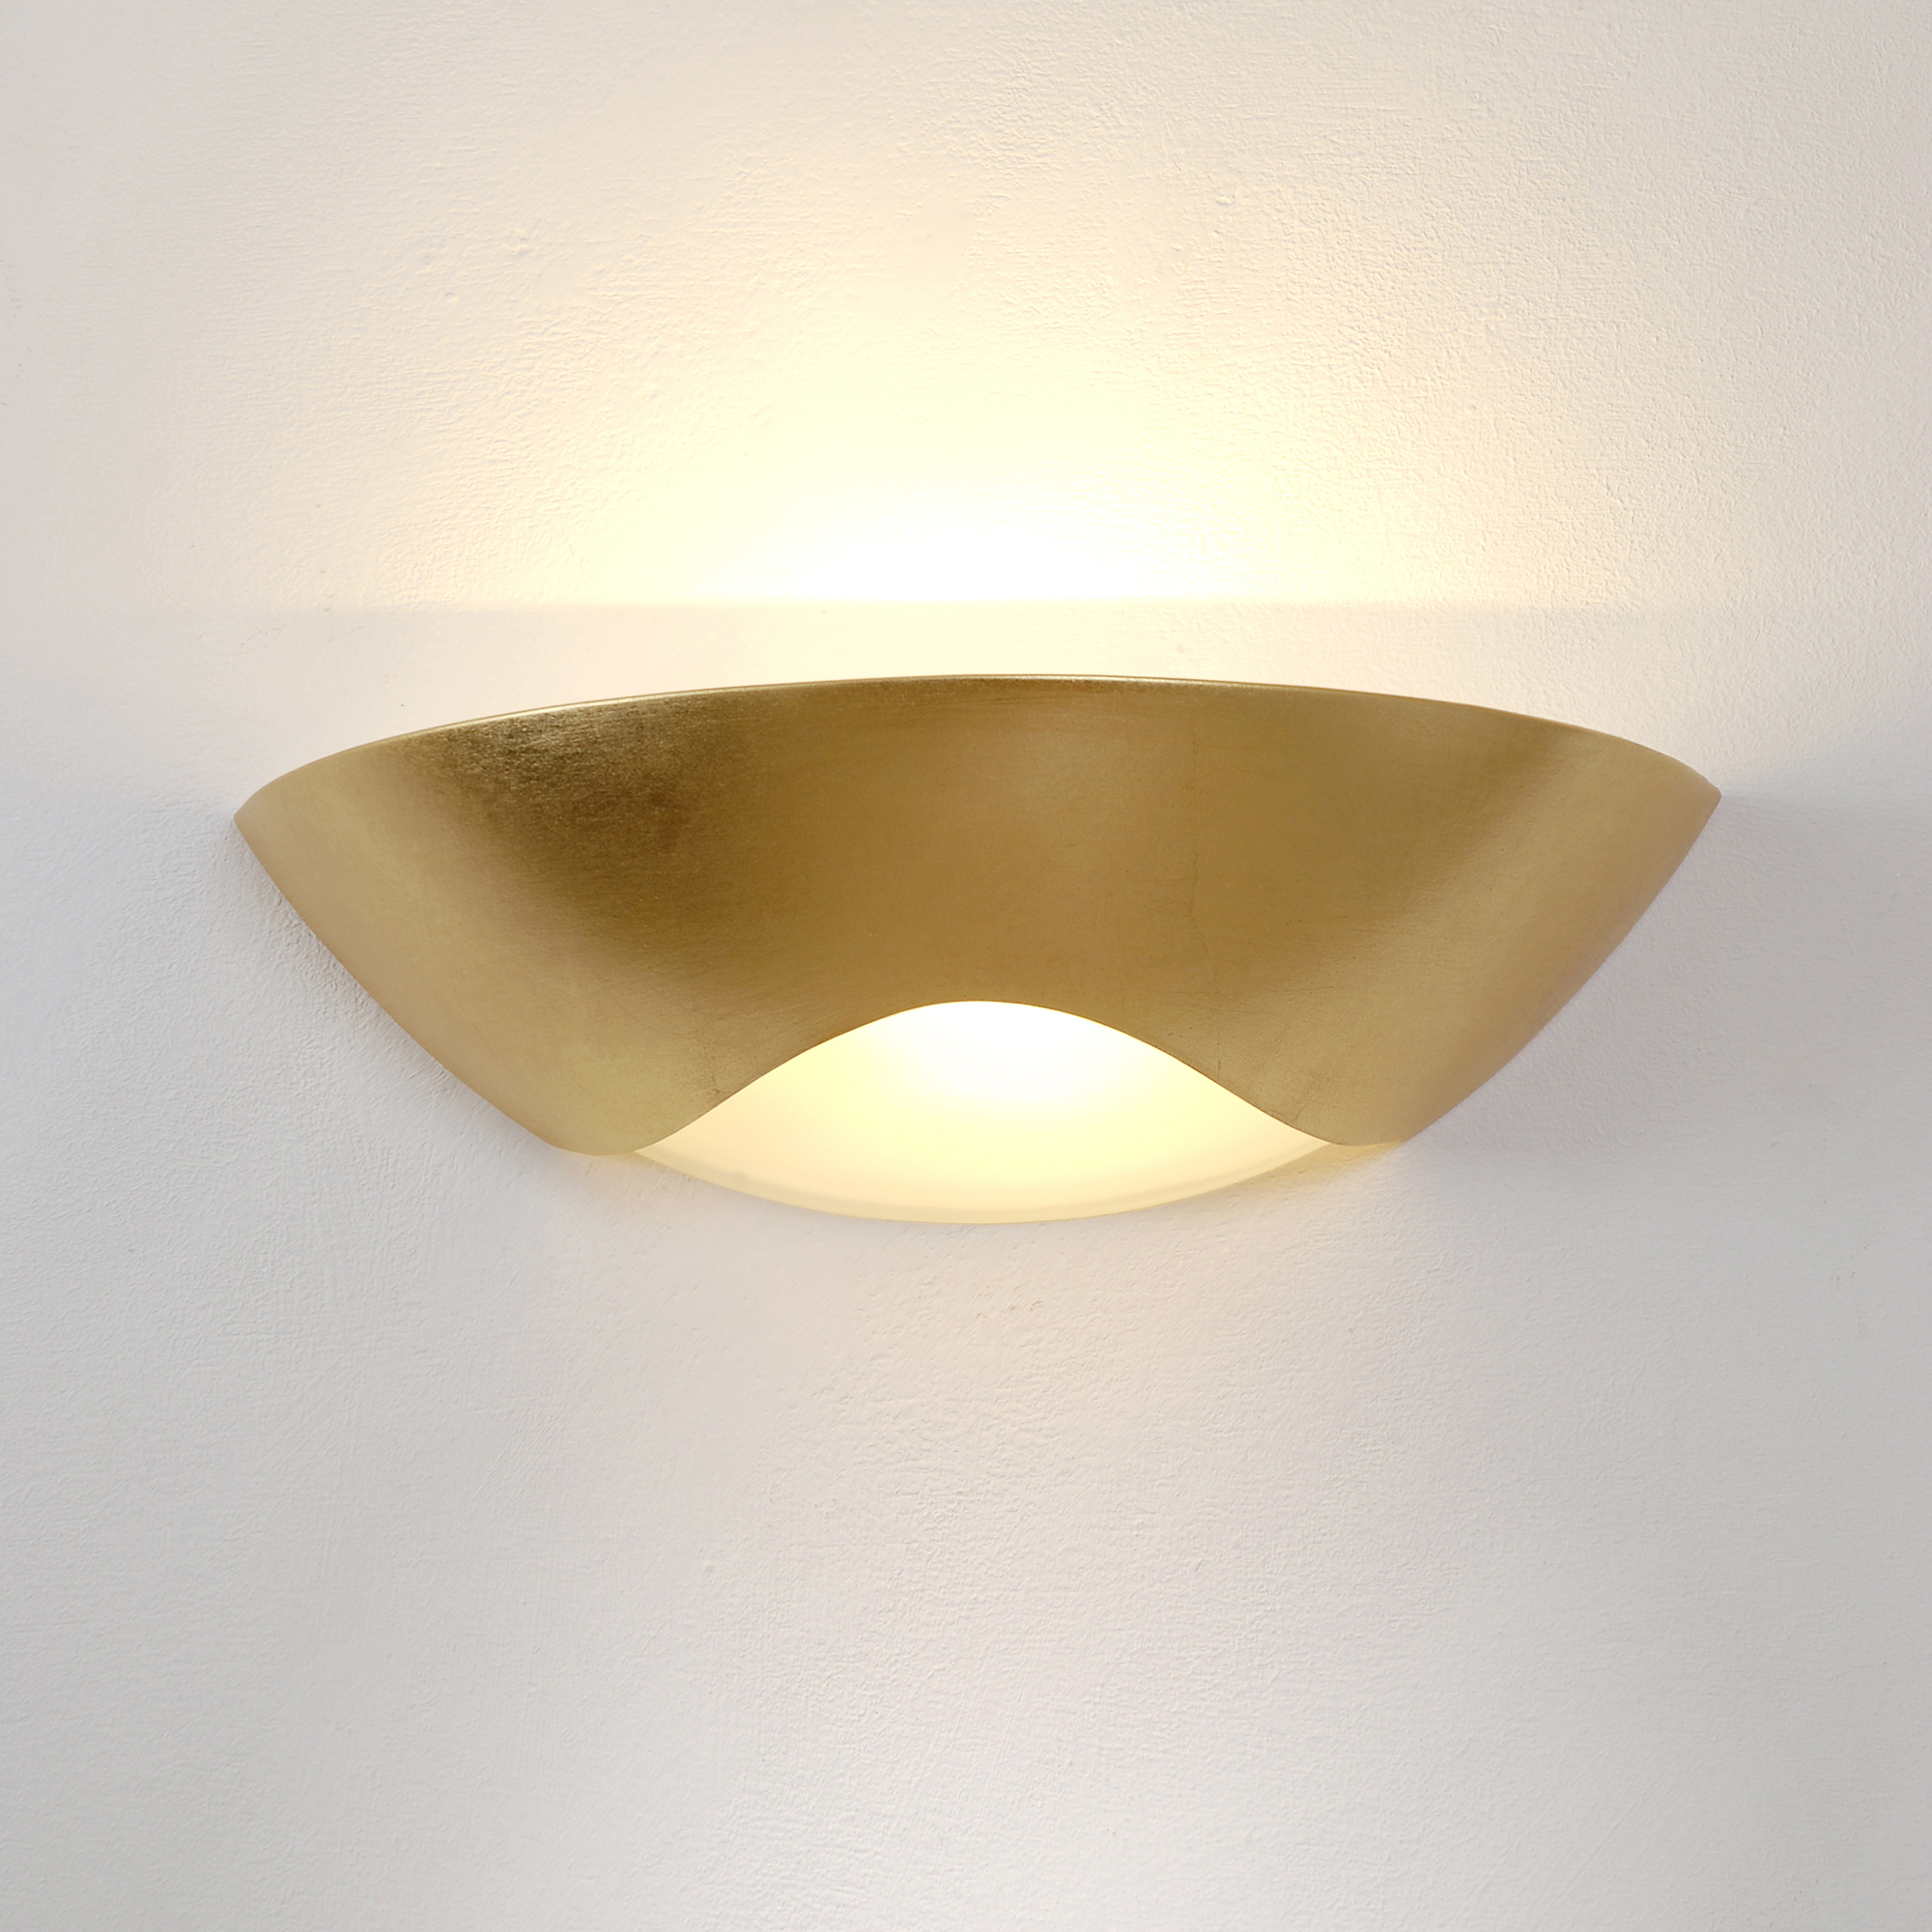 Holländer, Matteo Curve Wandleuchte, gold